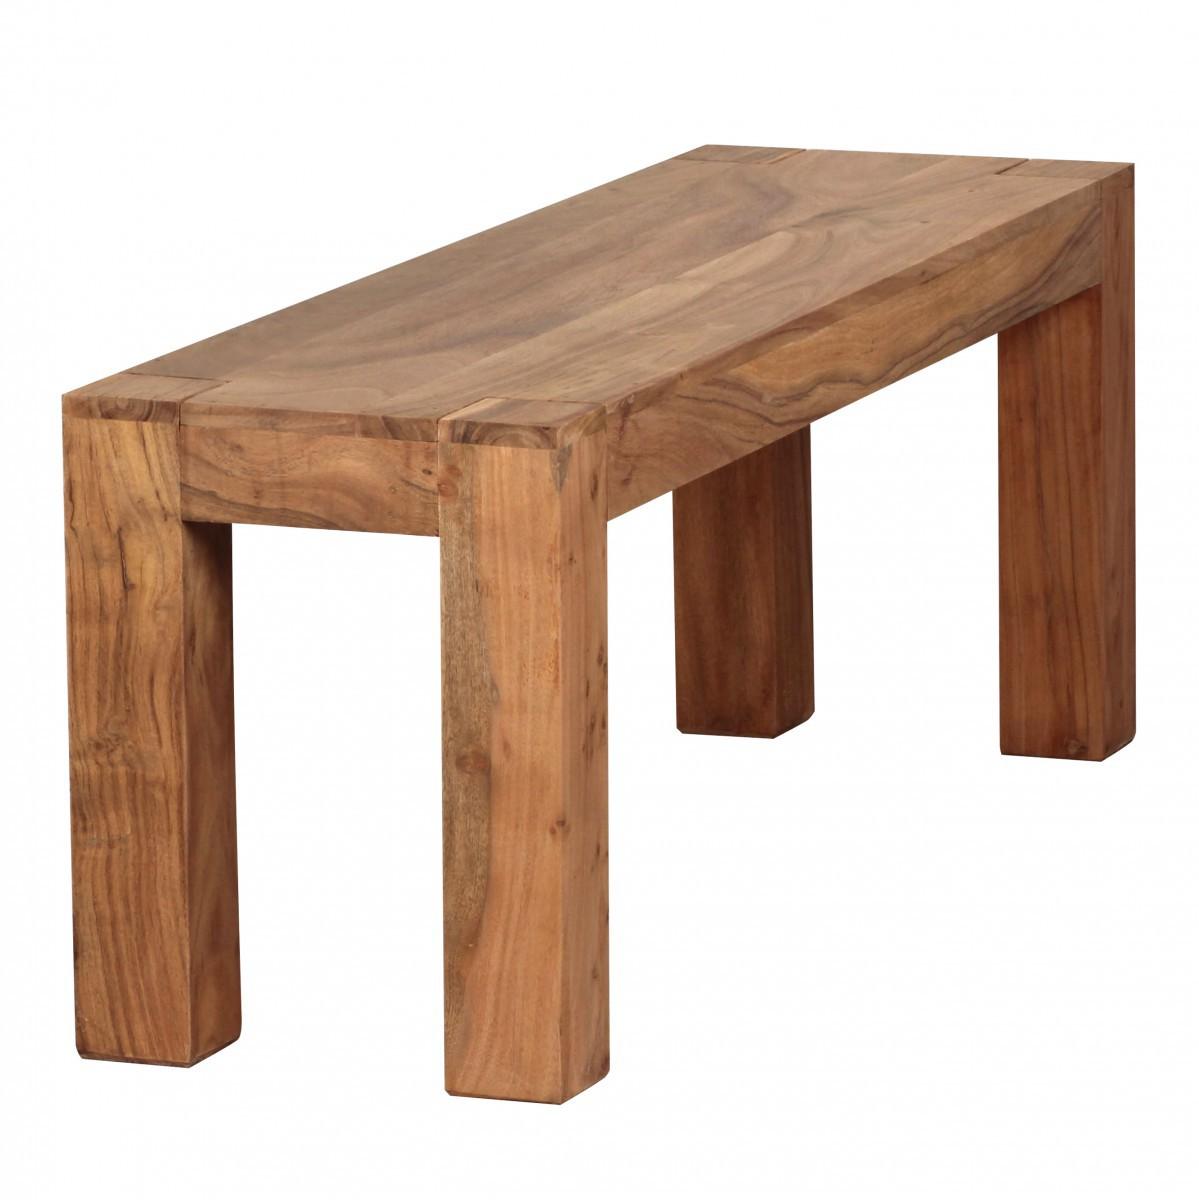 Finebuy akazie massivholz esszimmer sitzbank bank 120 x 35 for Esszimmer bank 120 cm